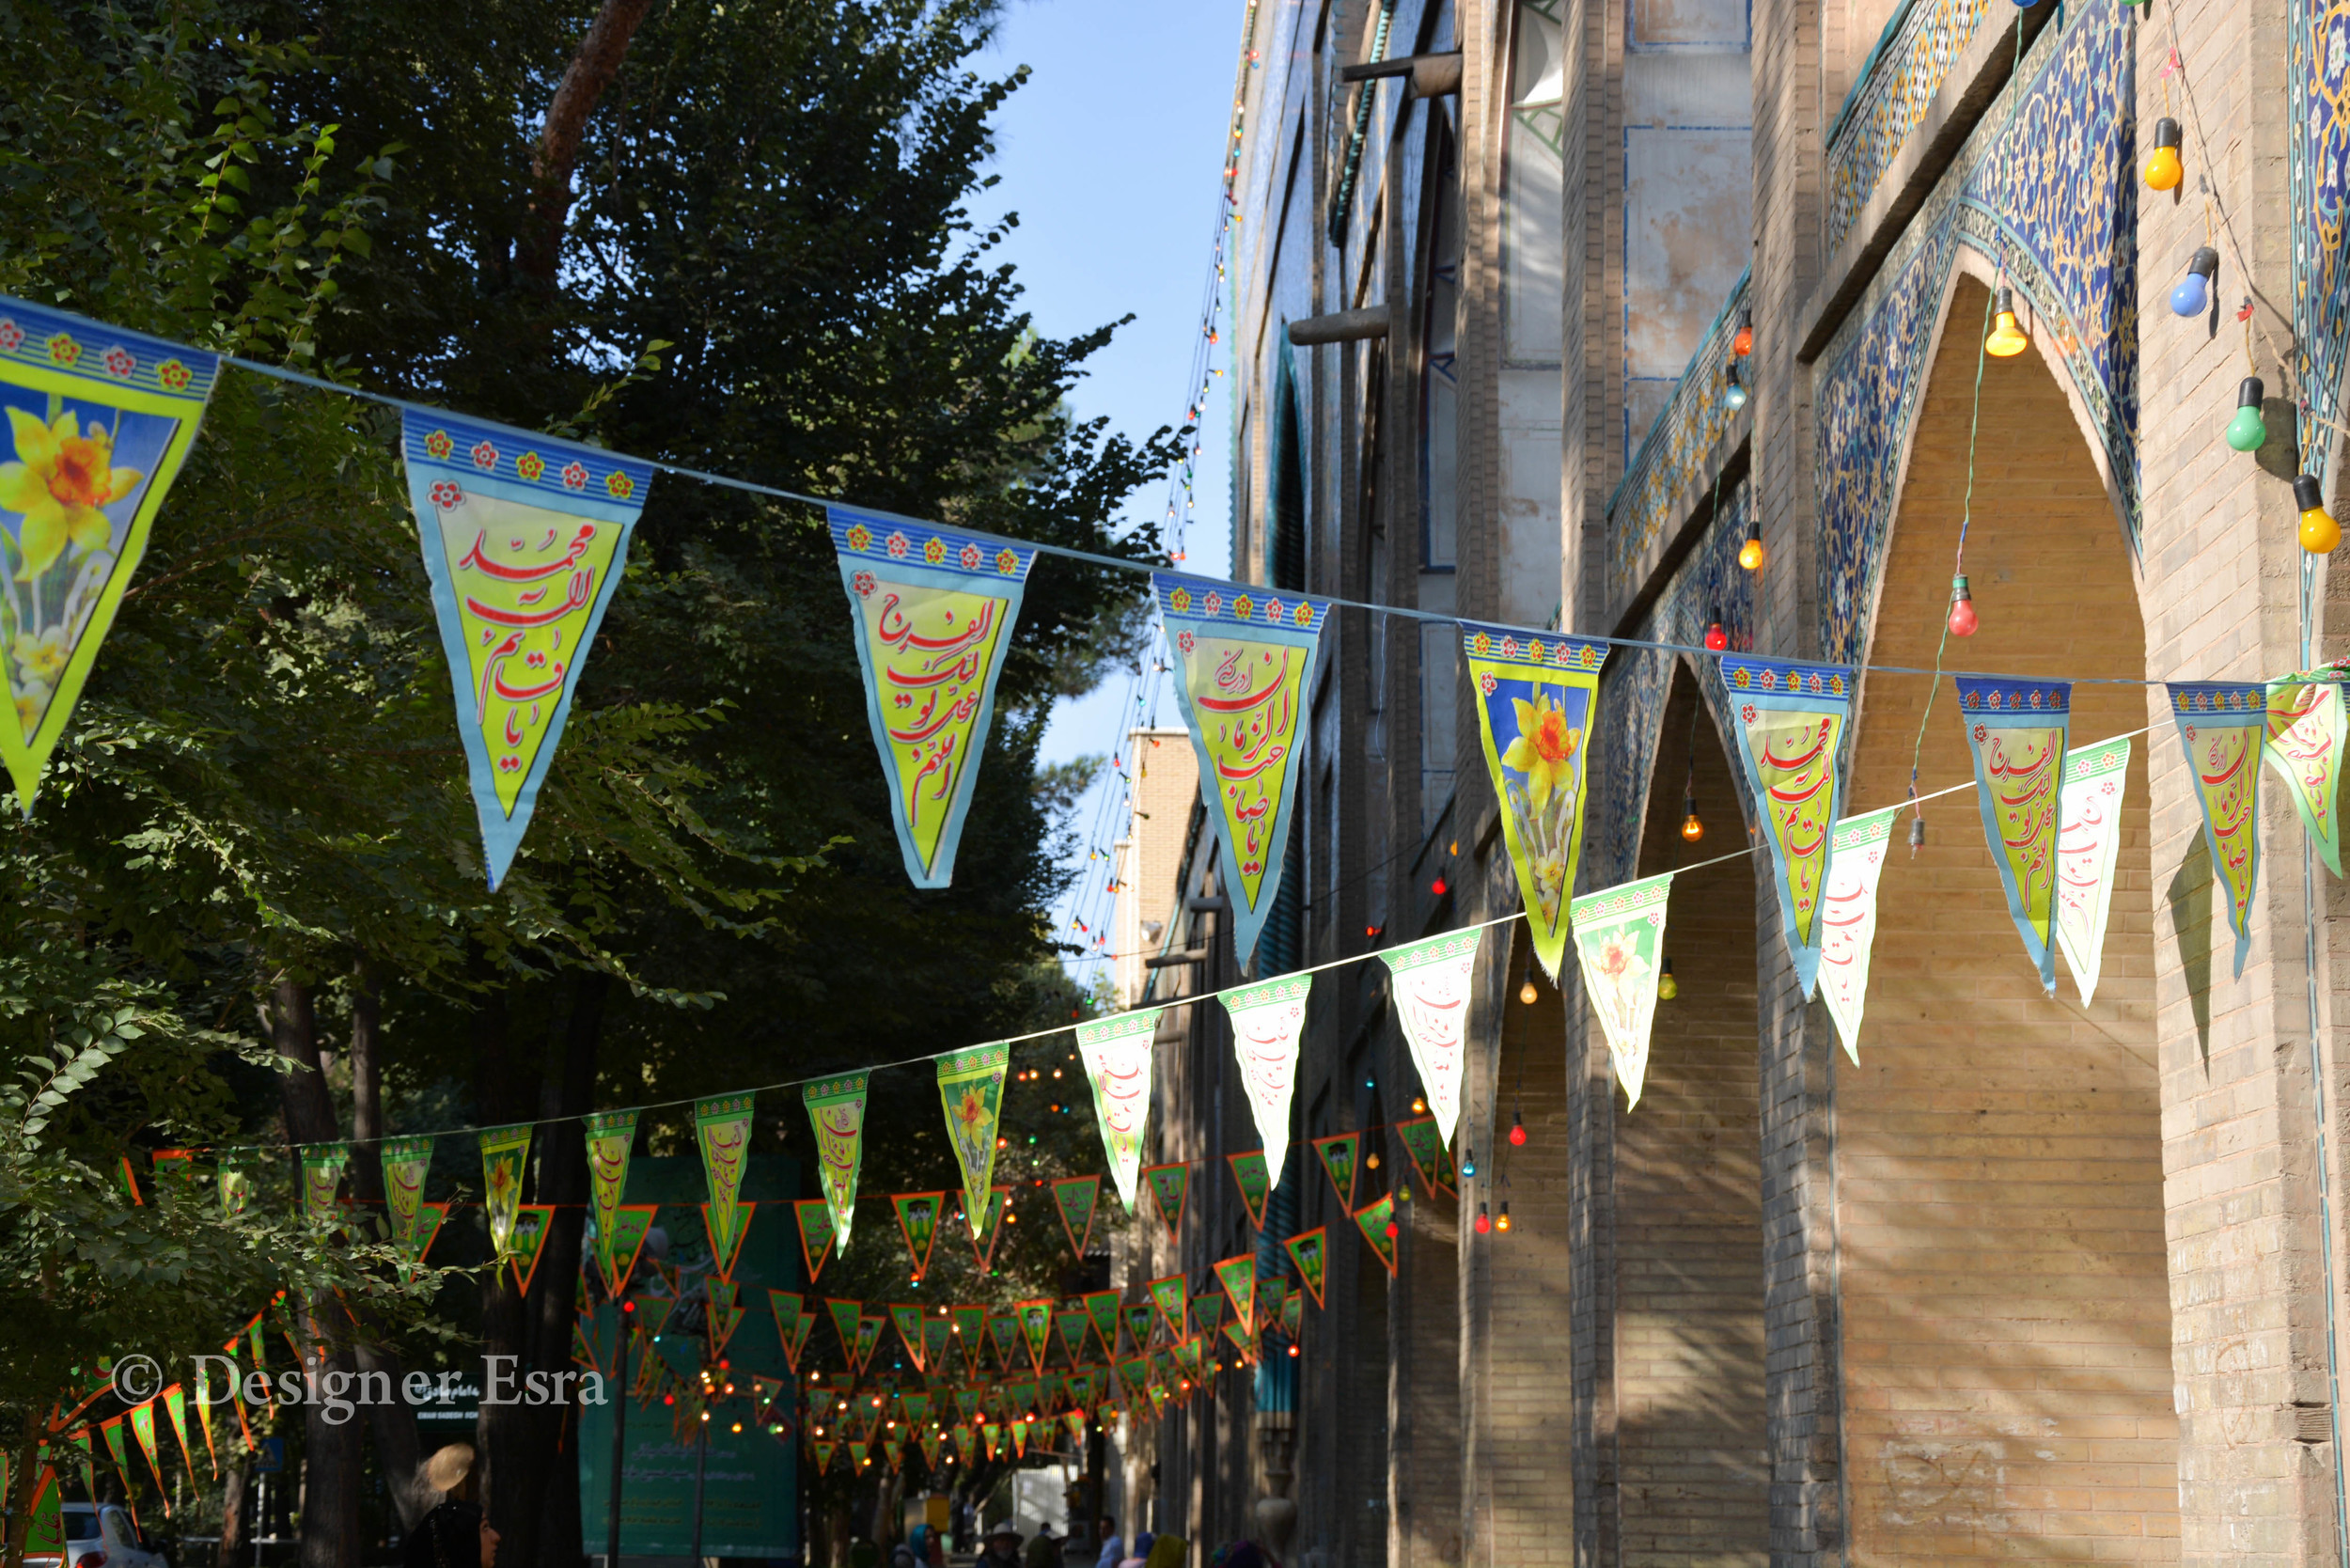 Celebratory Decorations in Iran